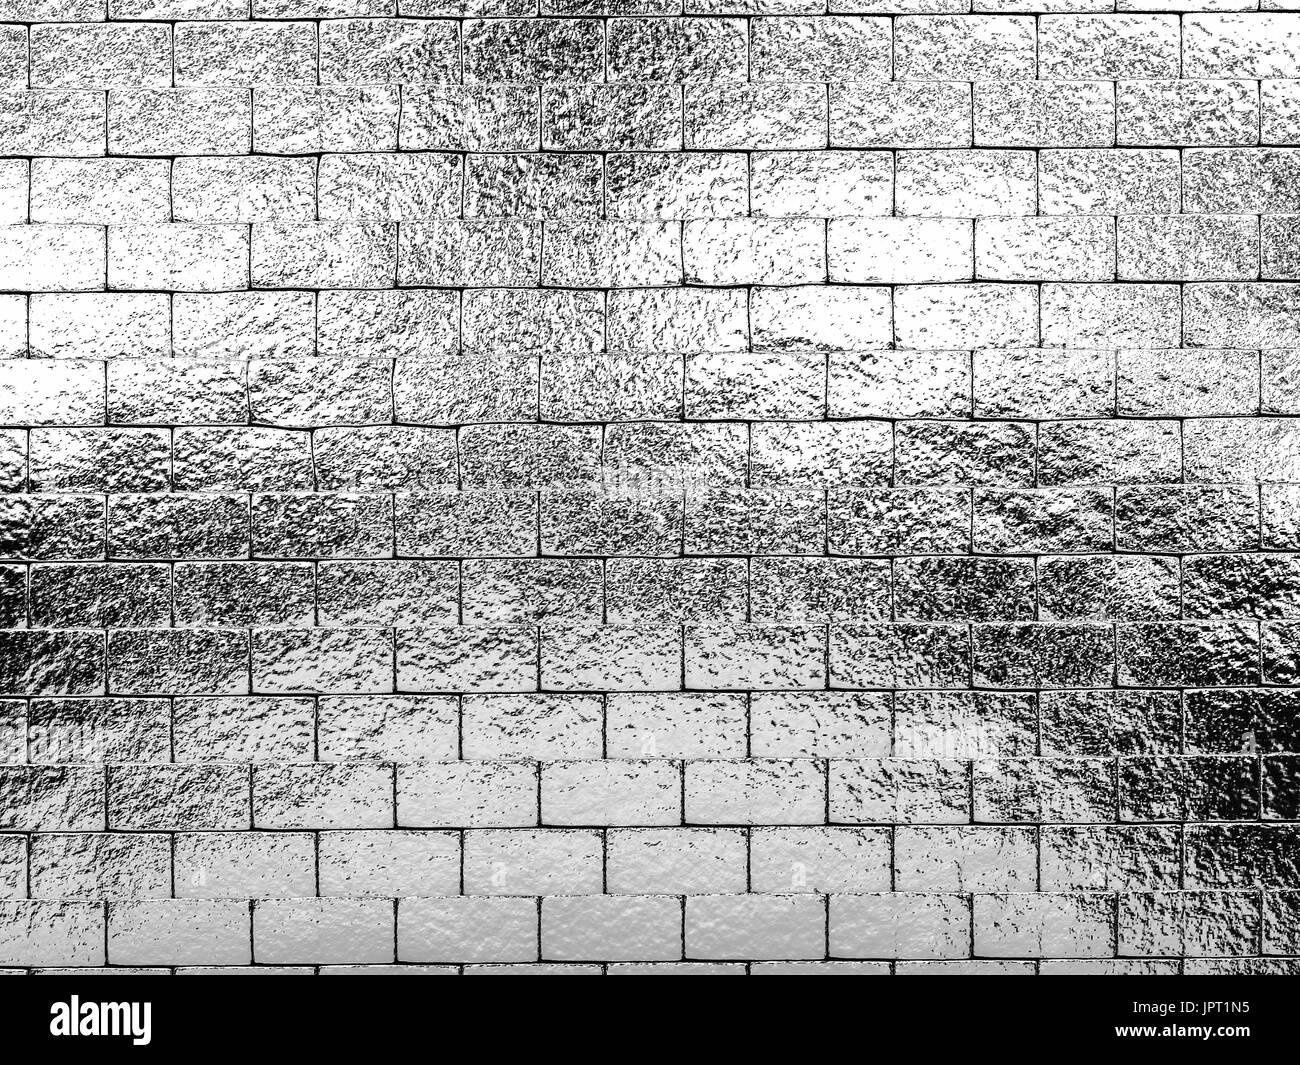 Le rendu 3d argent brillant wall background Photo Stock